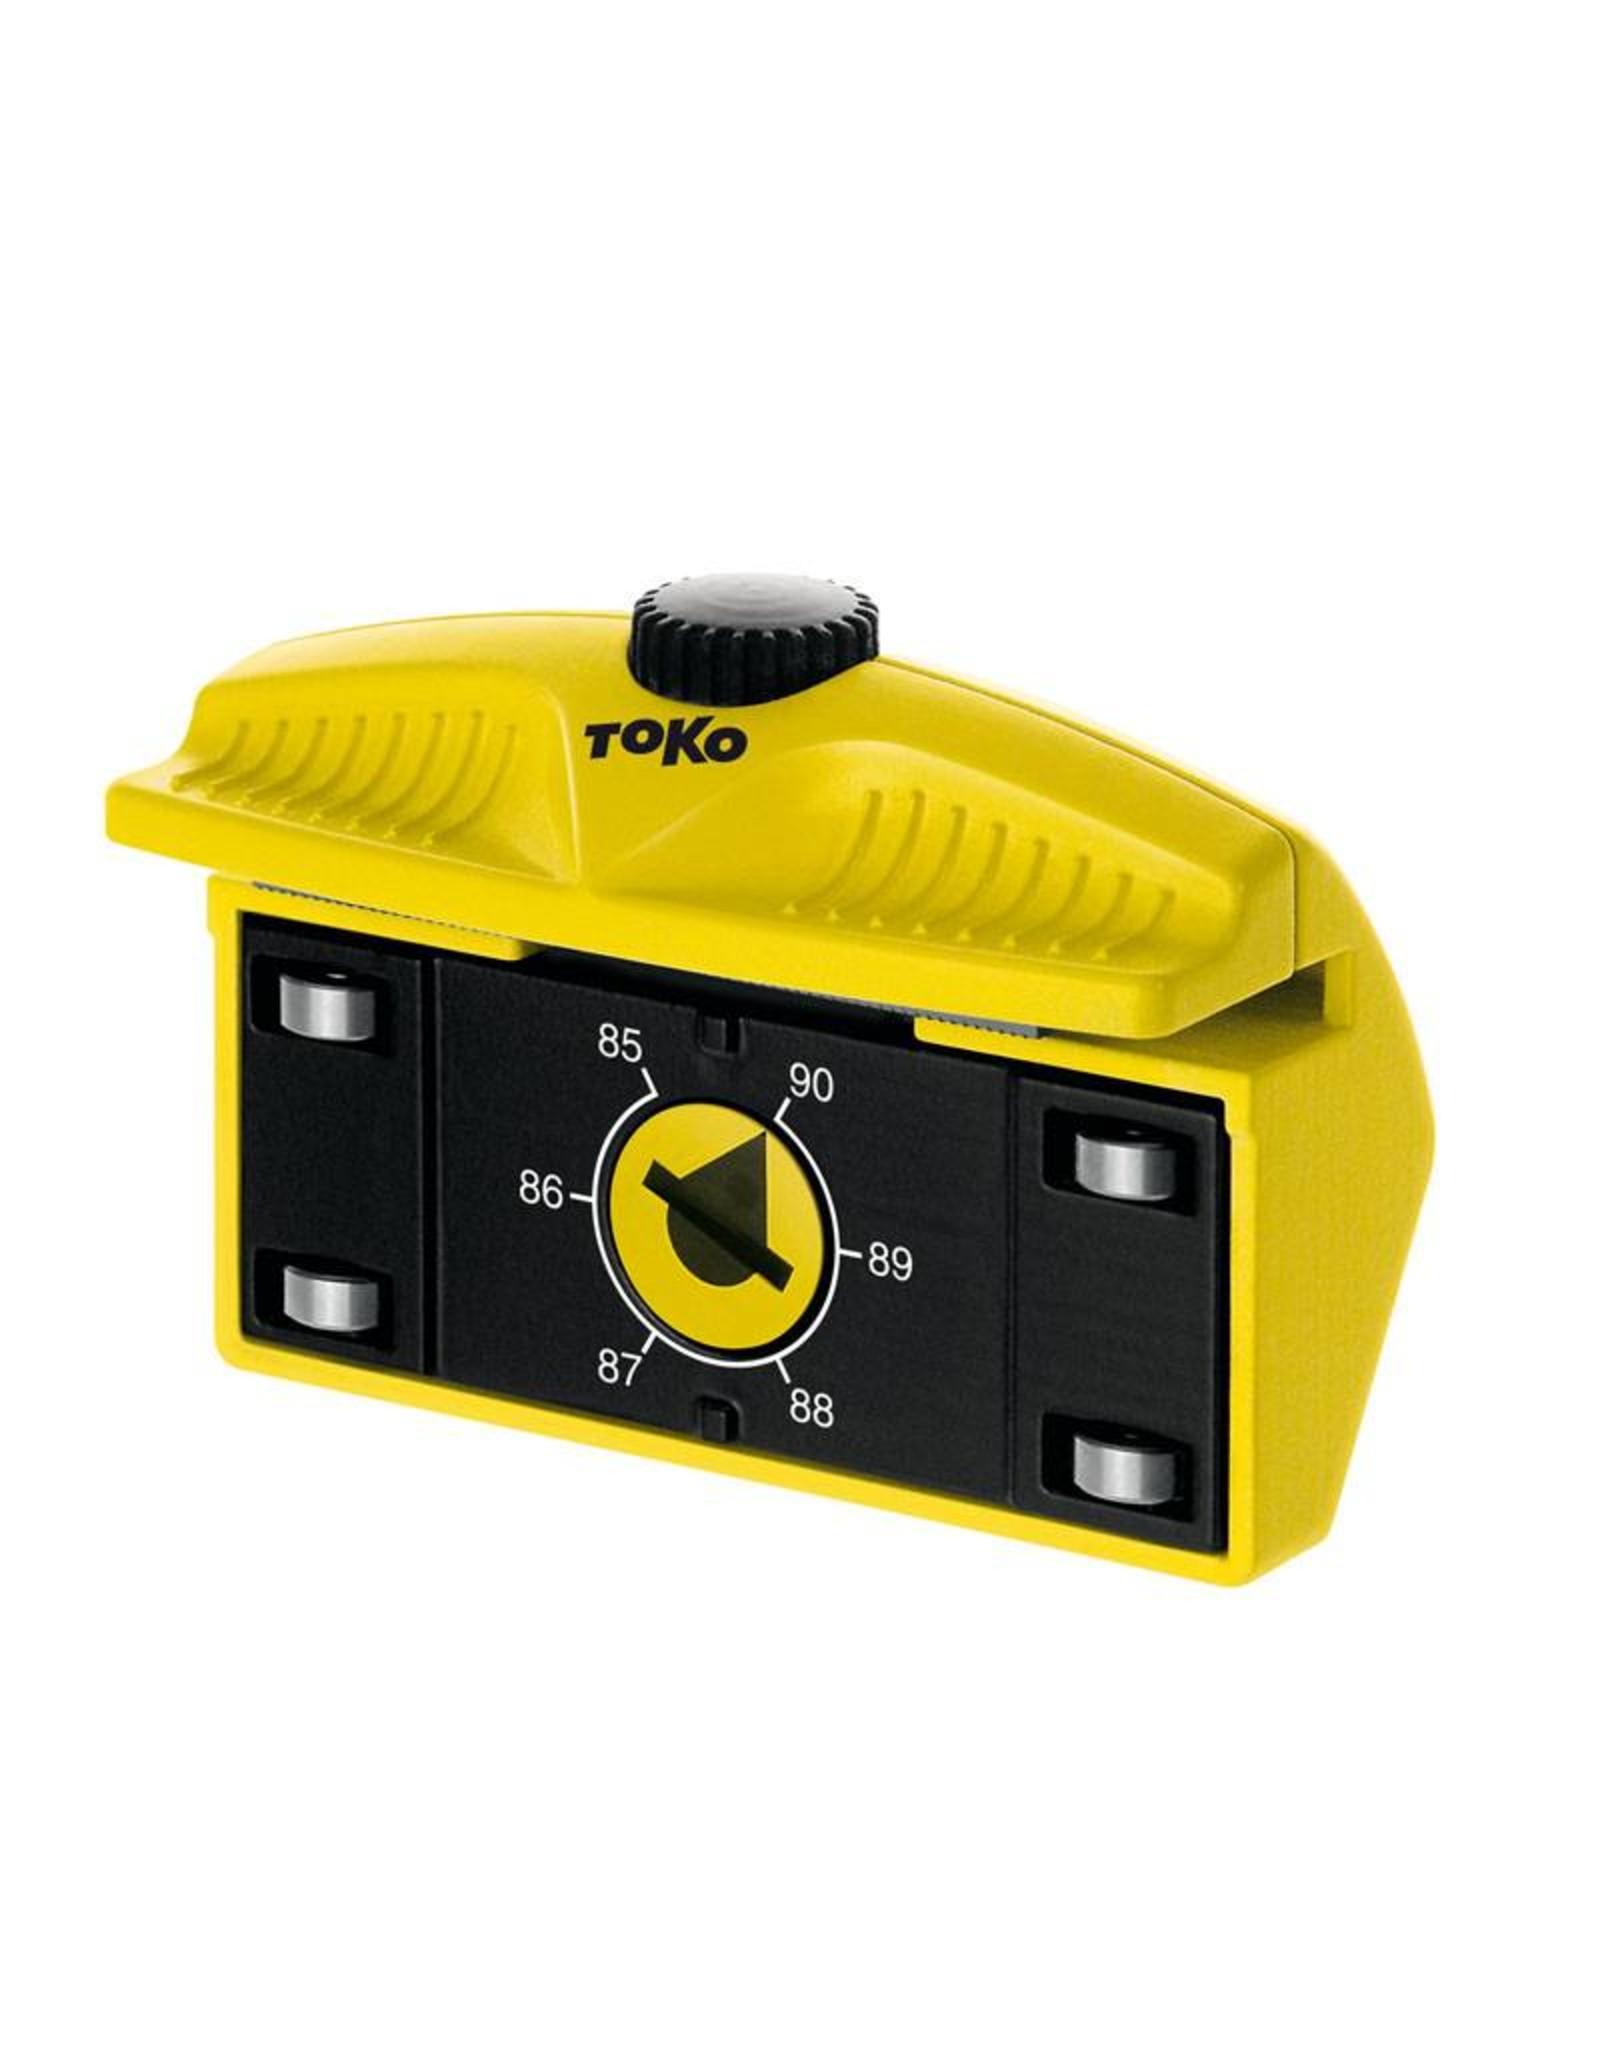 TOKO Toko Edge Tuner Pro